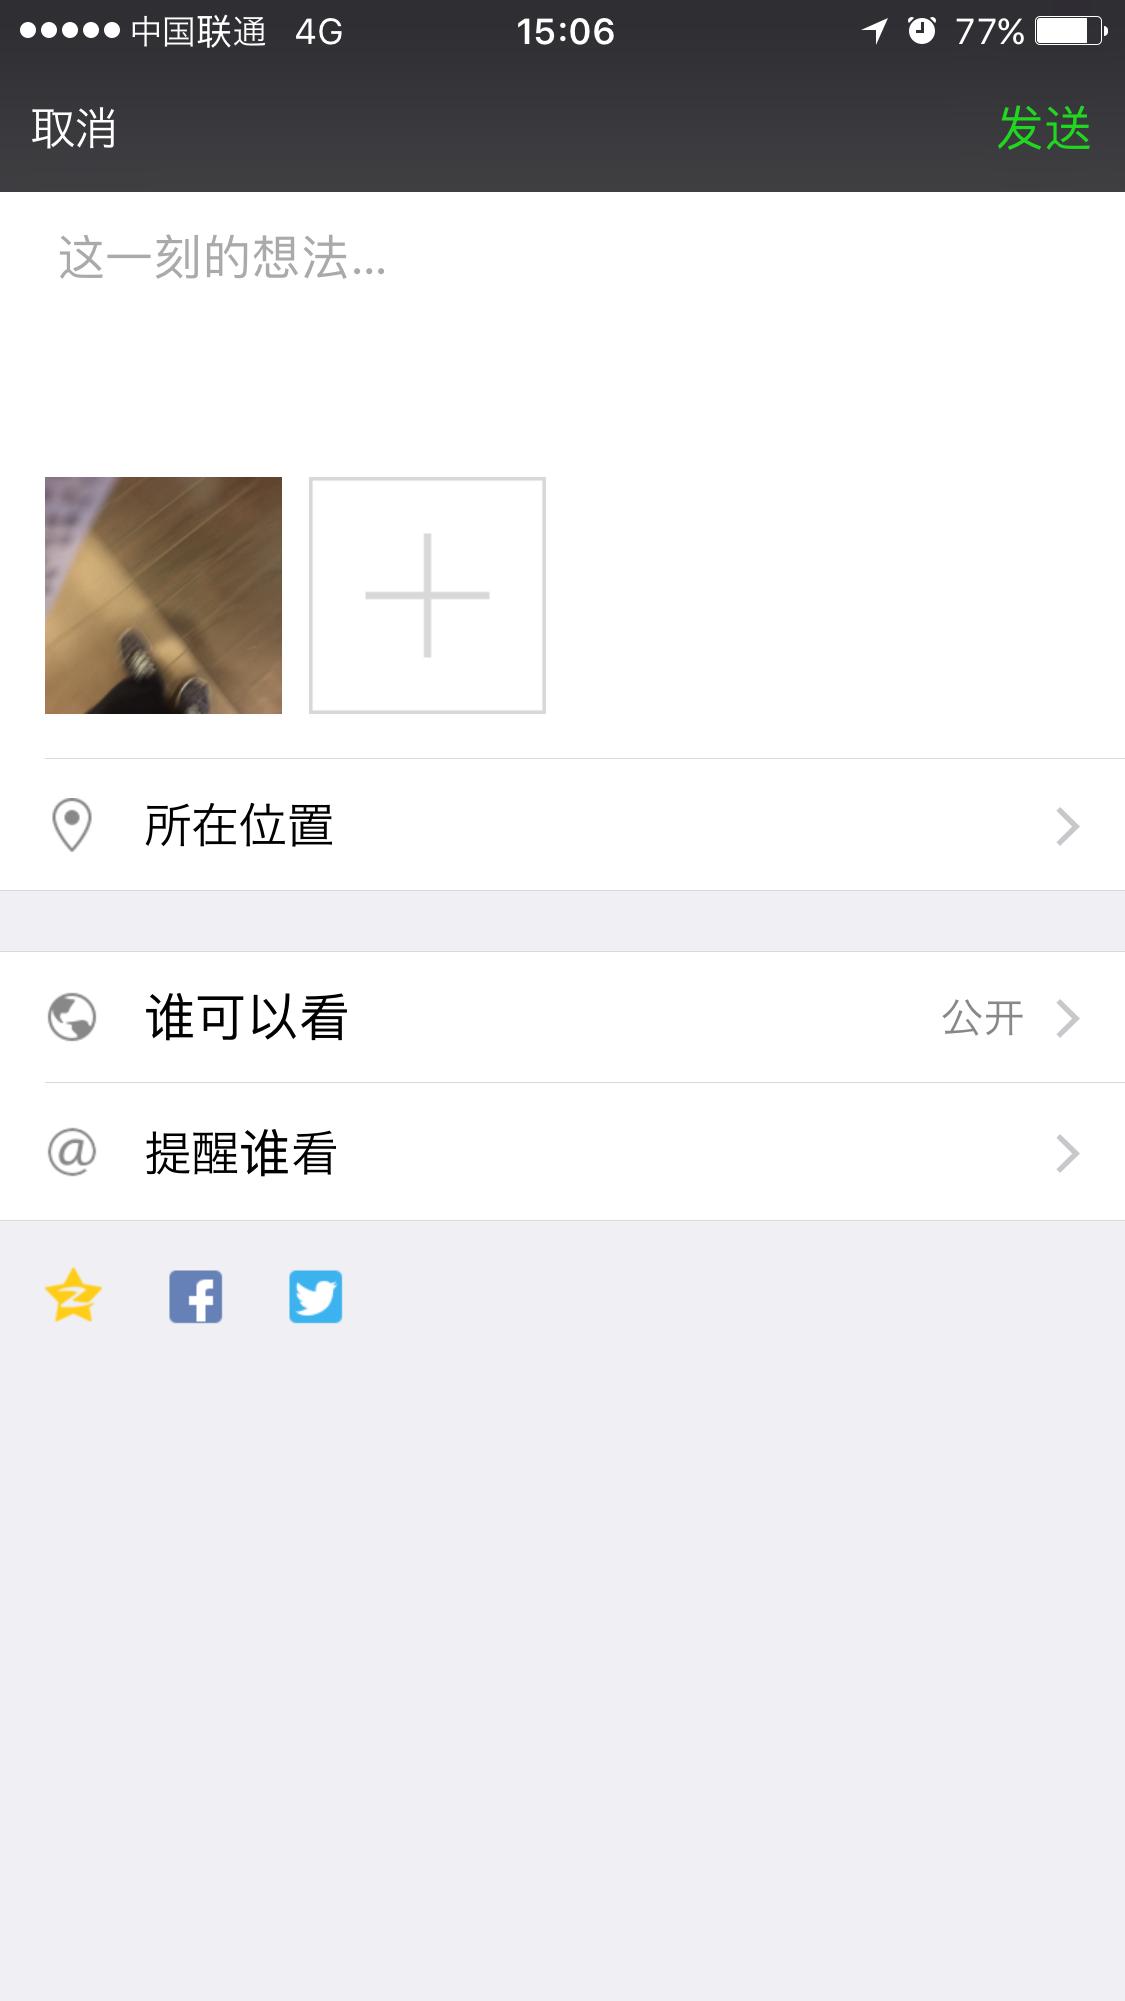 f:id:shan1tian2:20170519205545p:image